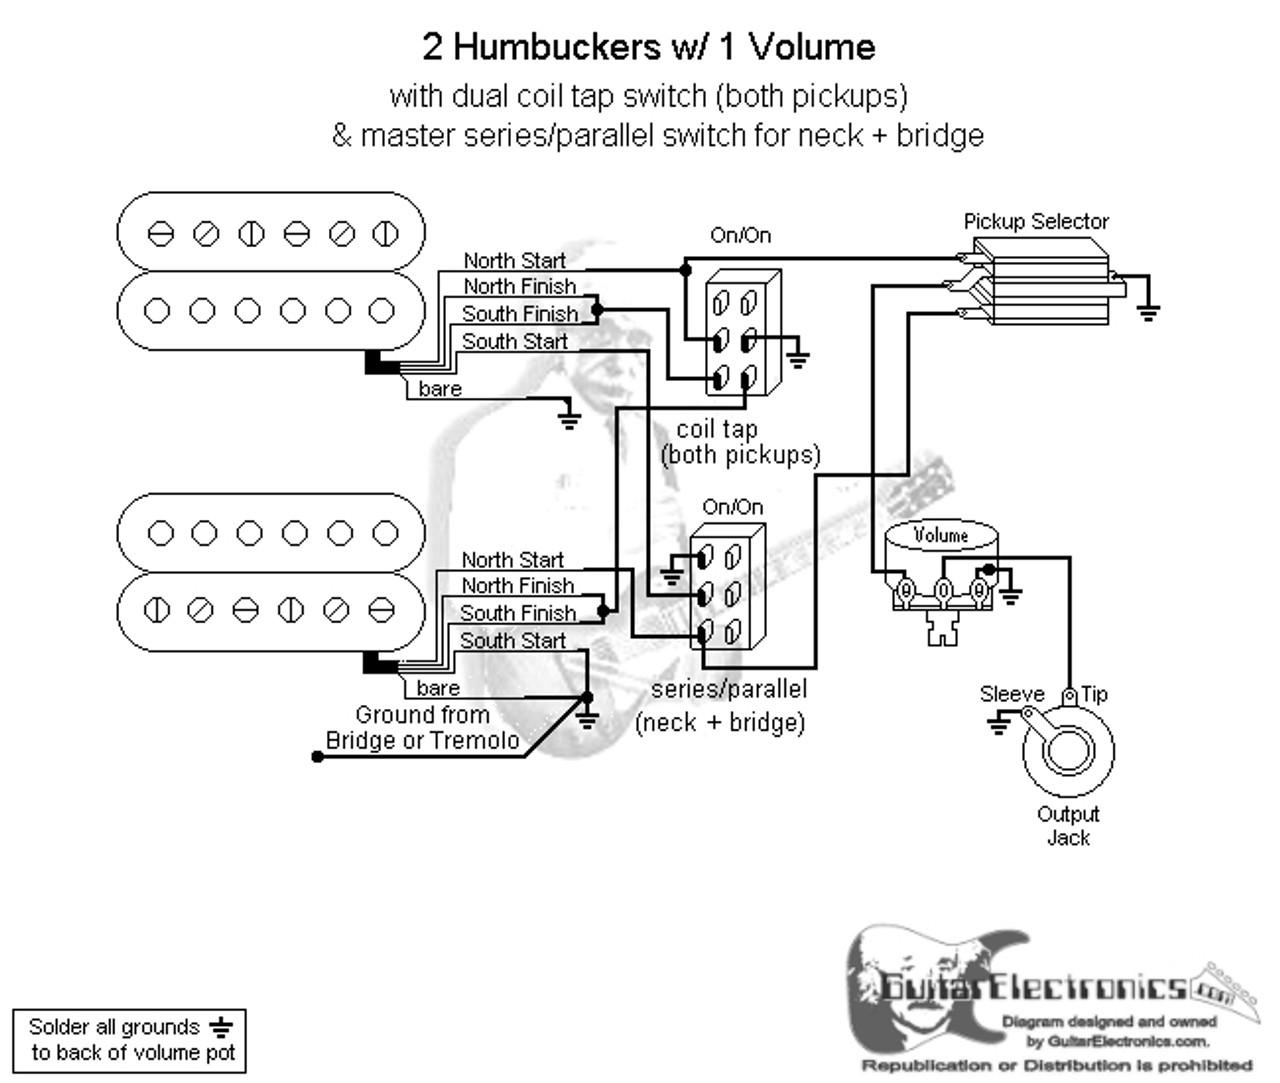 medium resolution of split coil wiring for toggle switch diagram wiring diagram split coil wiring for toggle switch diagram